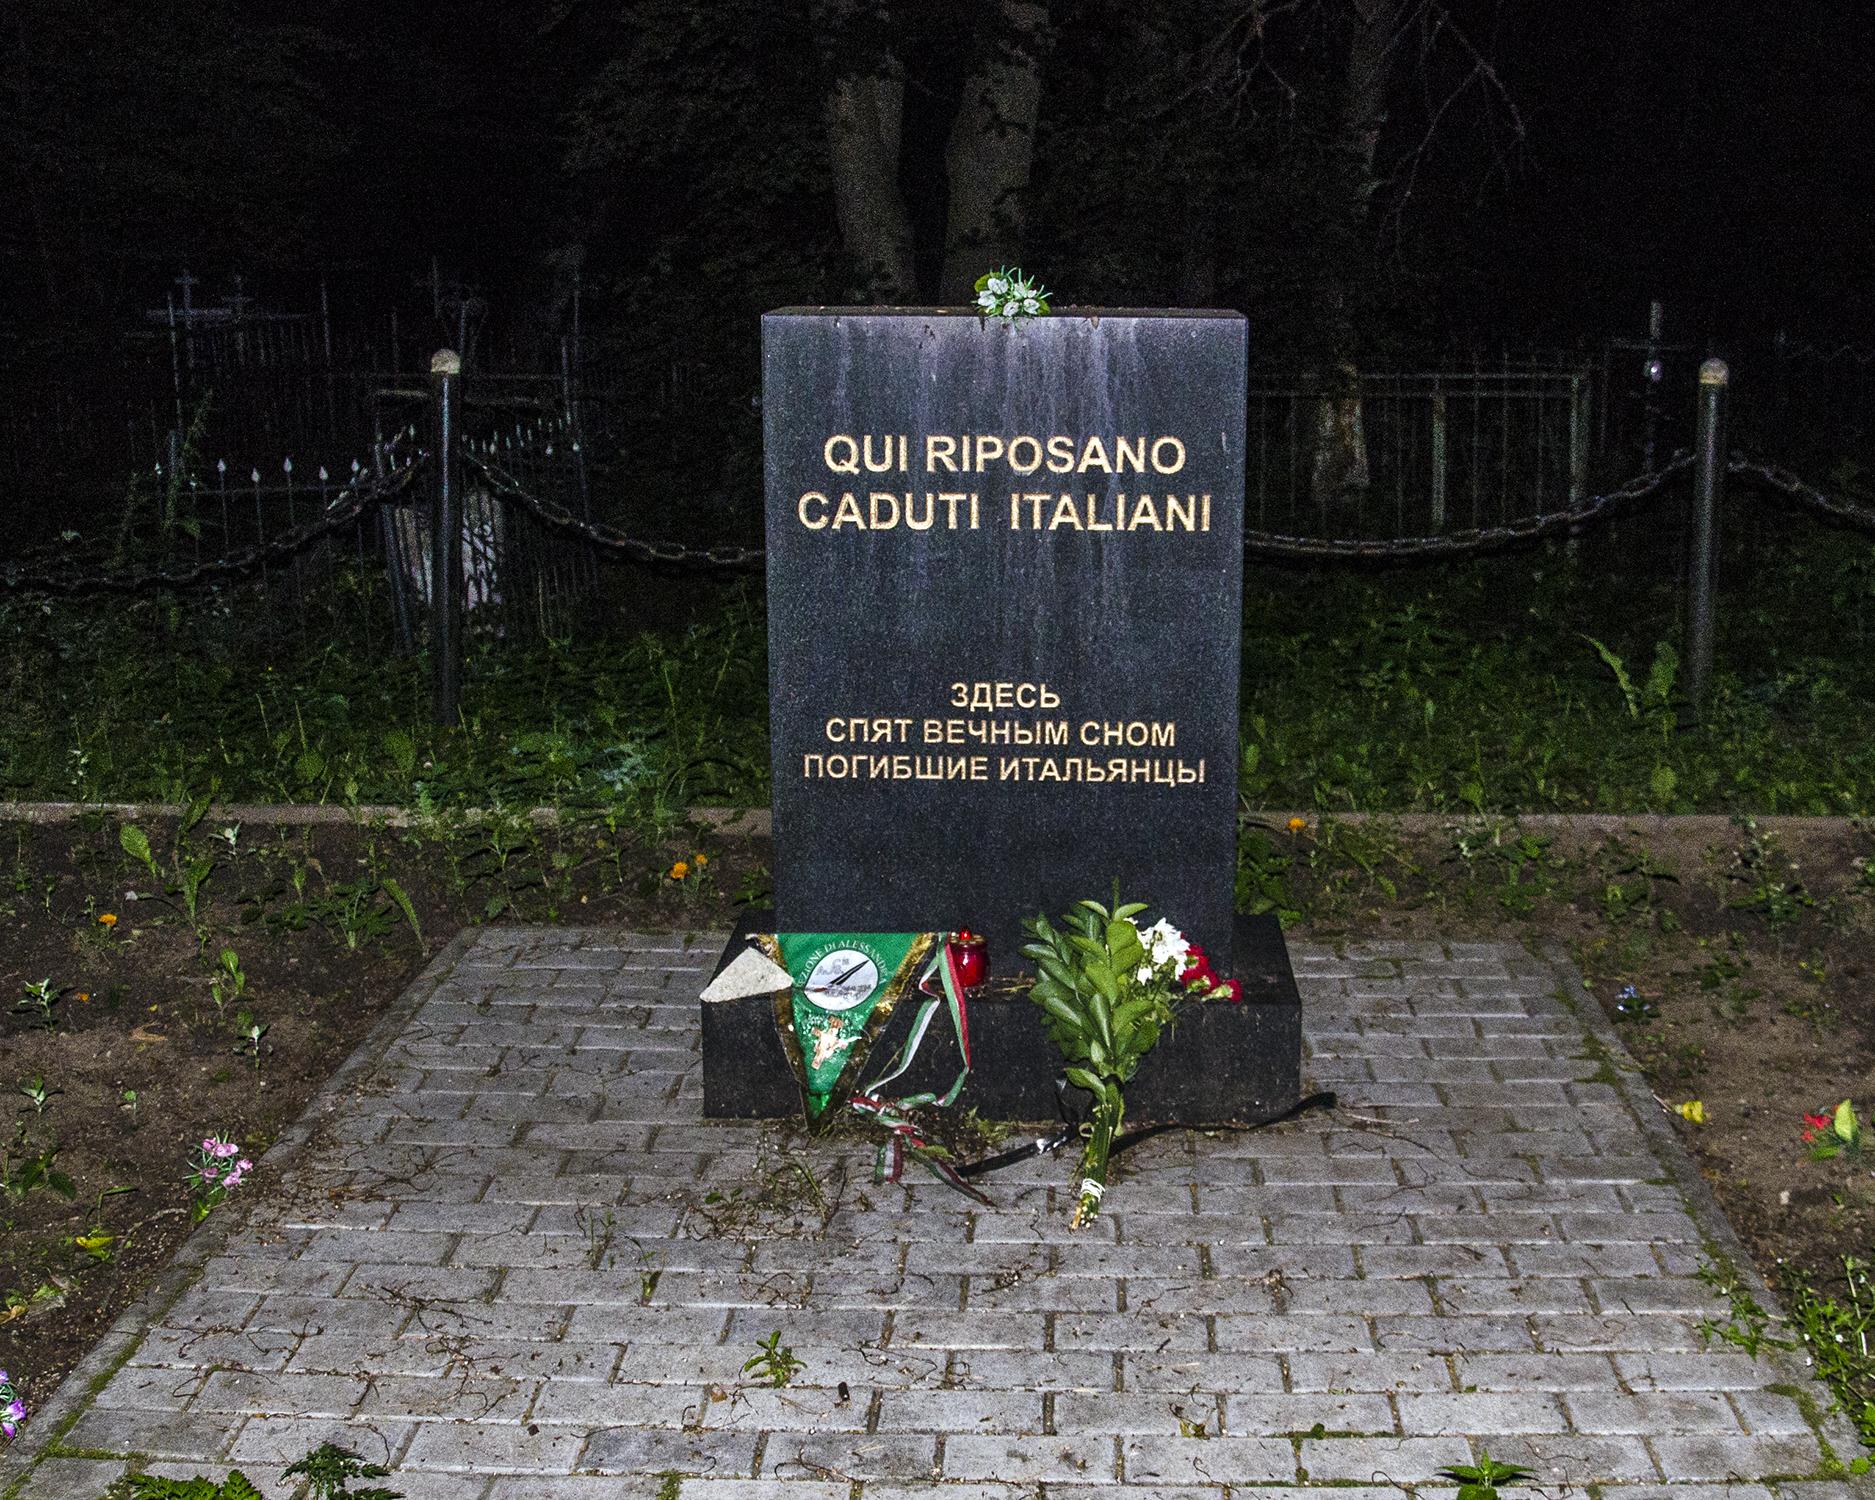 Suzdal - fossa comune italiani-9881.jpg